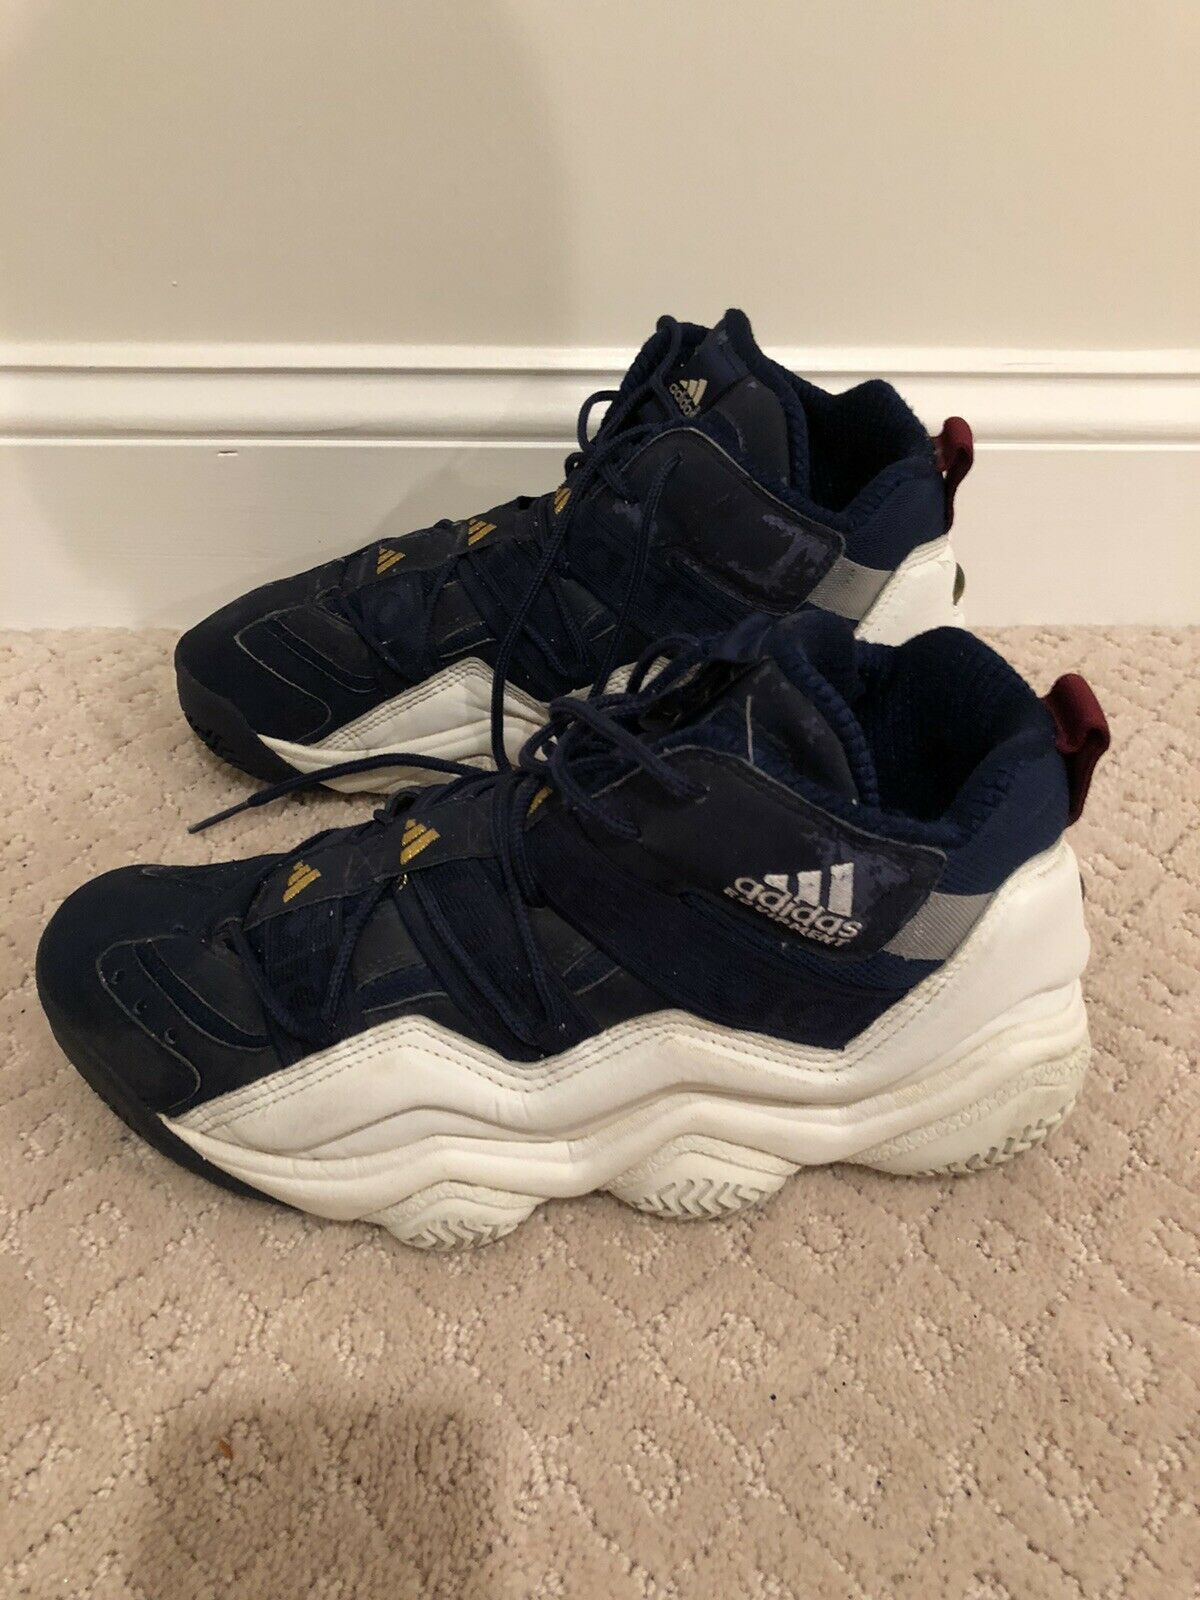 Kobe Bryant Adidas Sneakers. - image 2